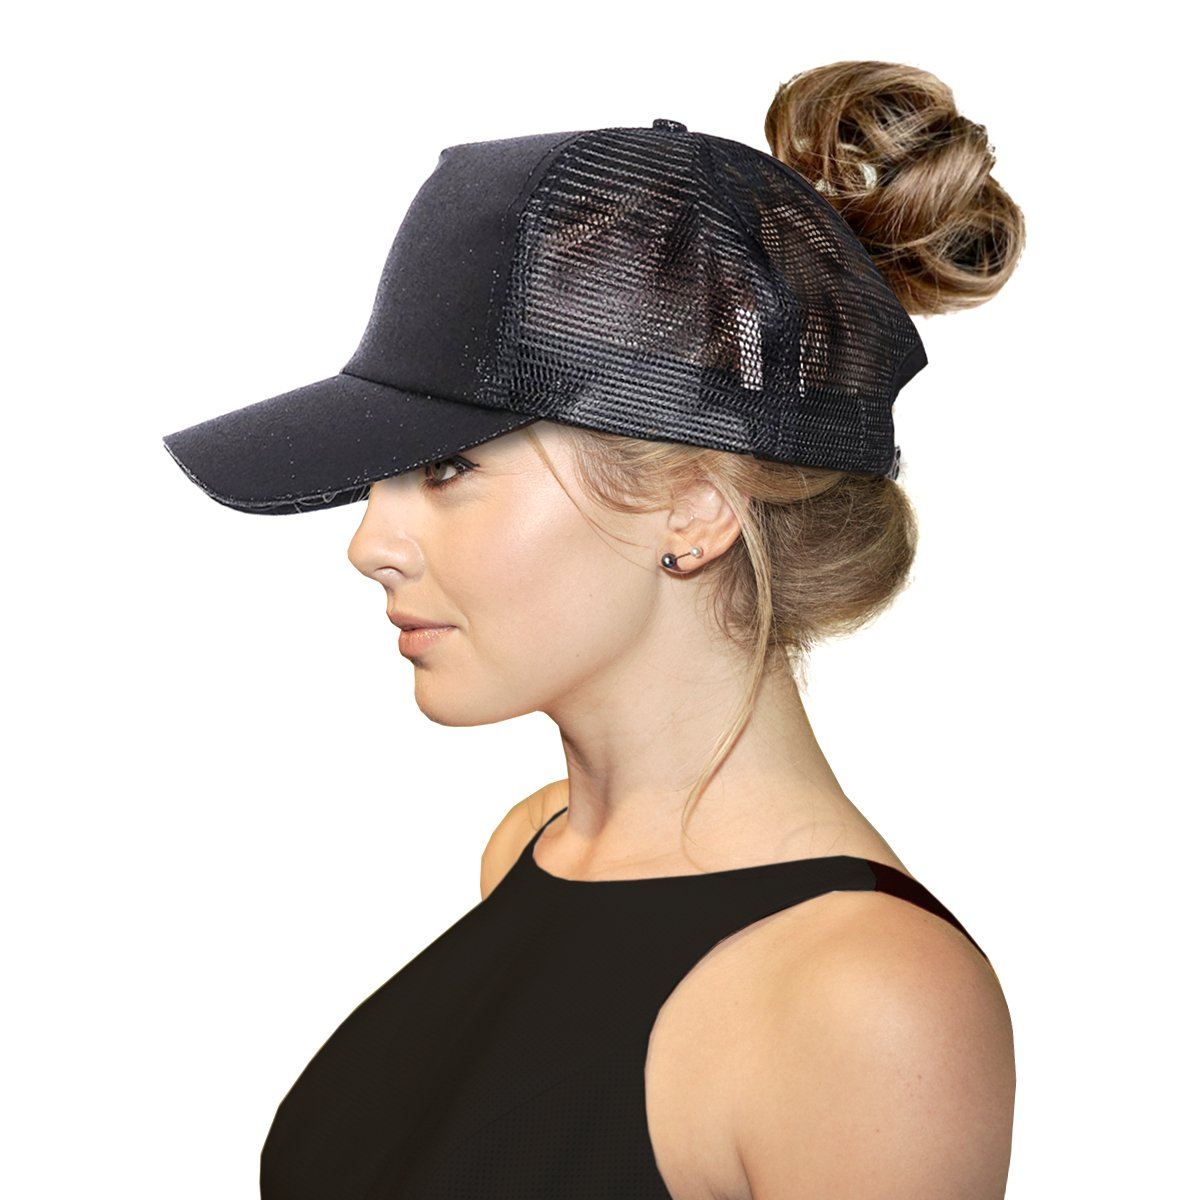 FADA Black Glitter Ponytail Baseball Cap for High Ponytail Women Girl Messy  Bun Shinny Ponycaps Baseball Hat at Amazon Women s Clothing store  c3cda15c2e2